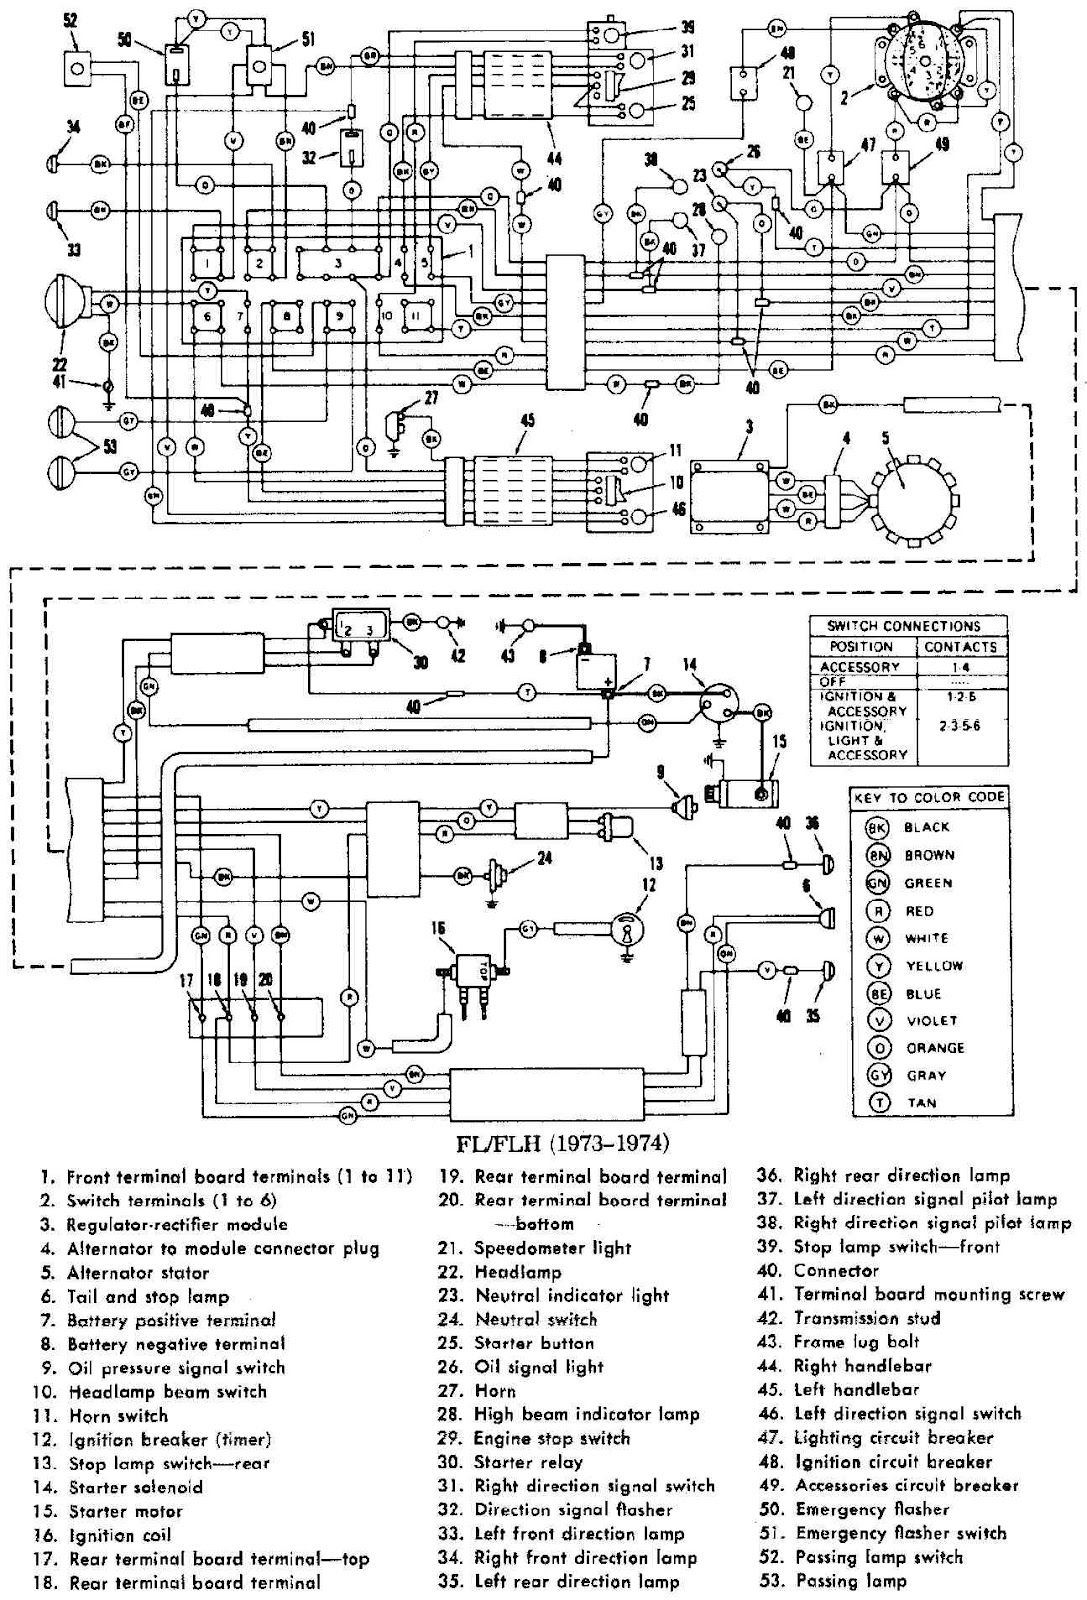 1973 harley davidson wiring diagram 1973 harley pinterest rh pinterest com 1973 harley davidson golf cart [ 1087 x 1600 Pixel ]